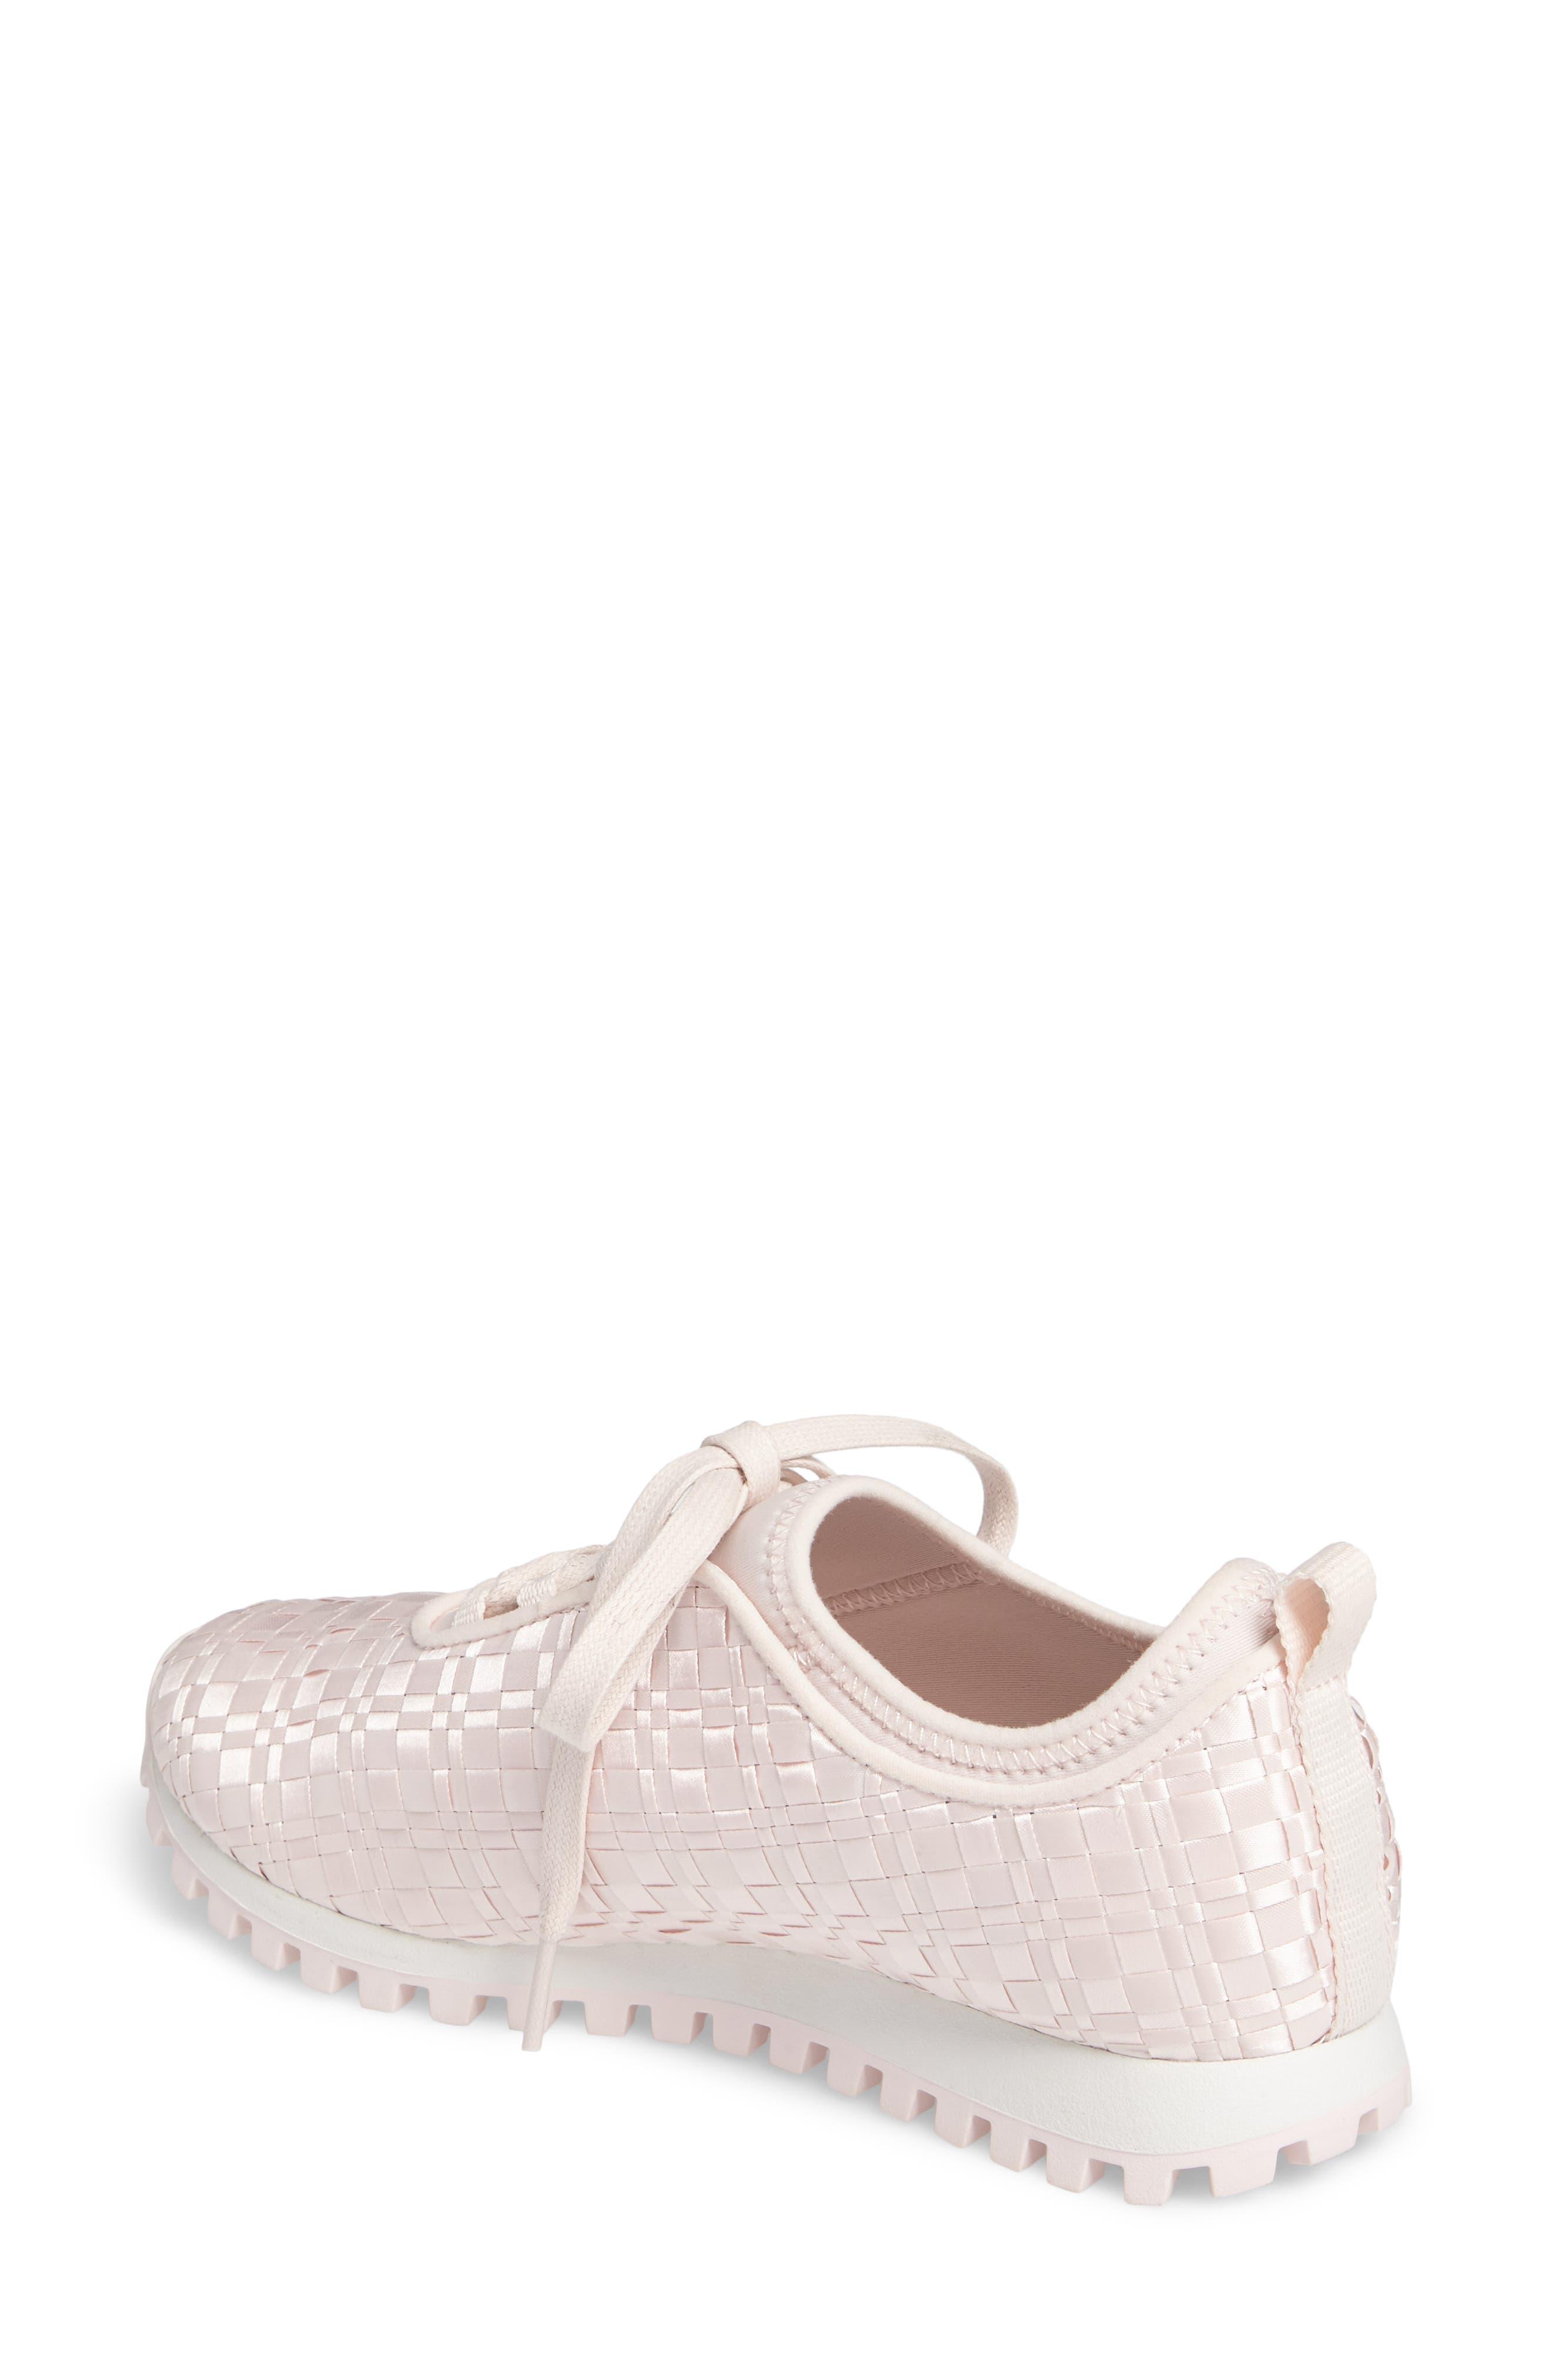 Lynn Sock Fit Woven Sneaker,                             Alternate thumbnail 4, color,